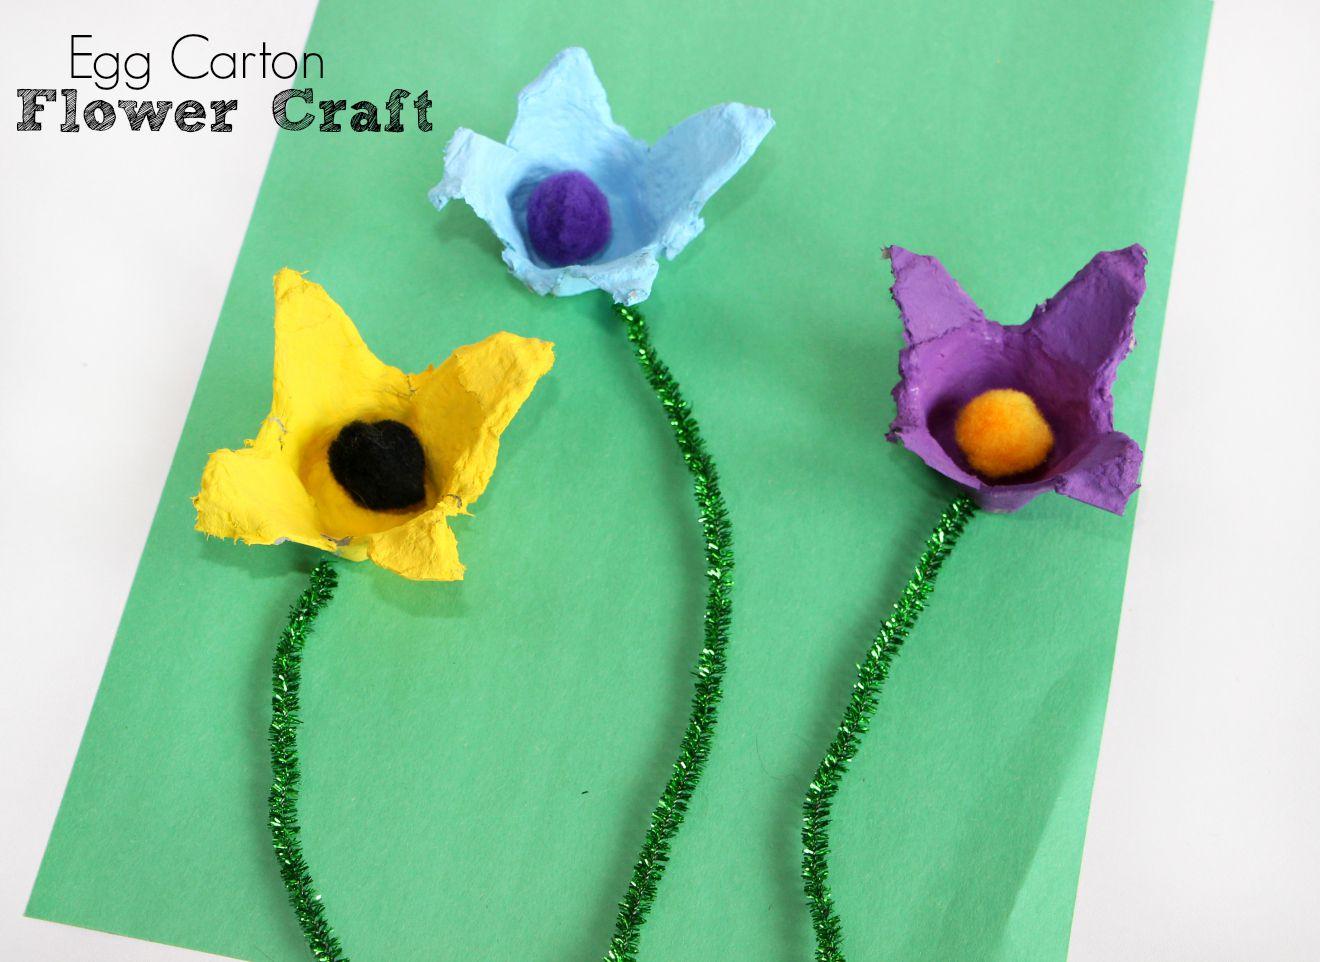 Egg Carton Flower Craft